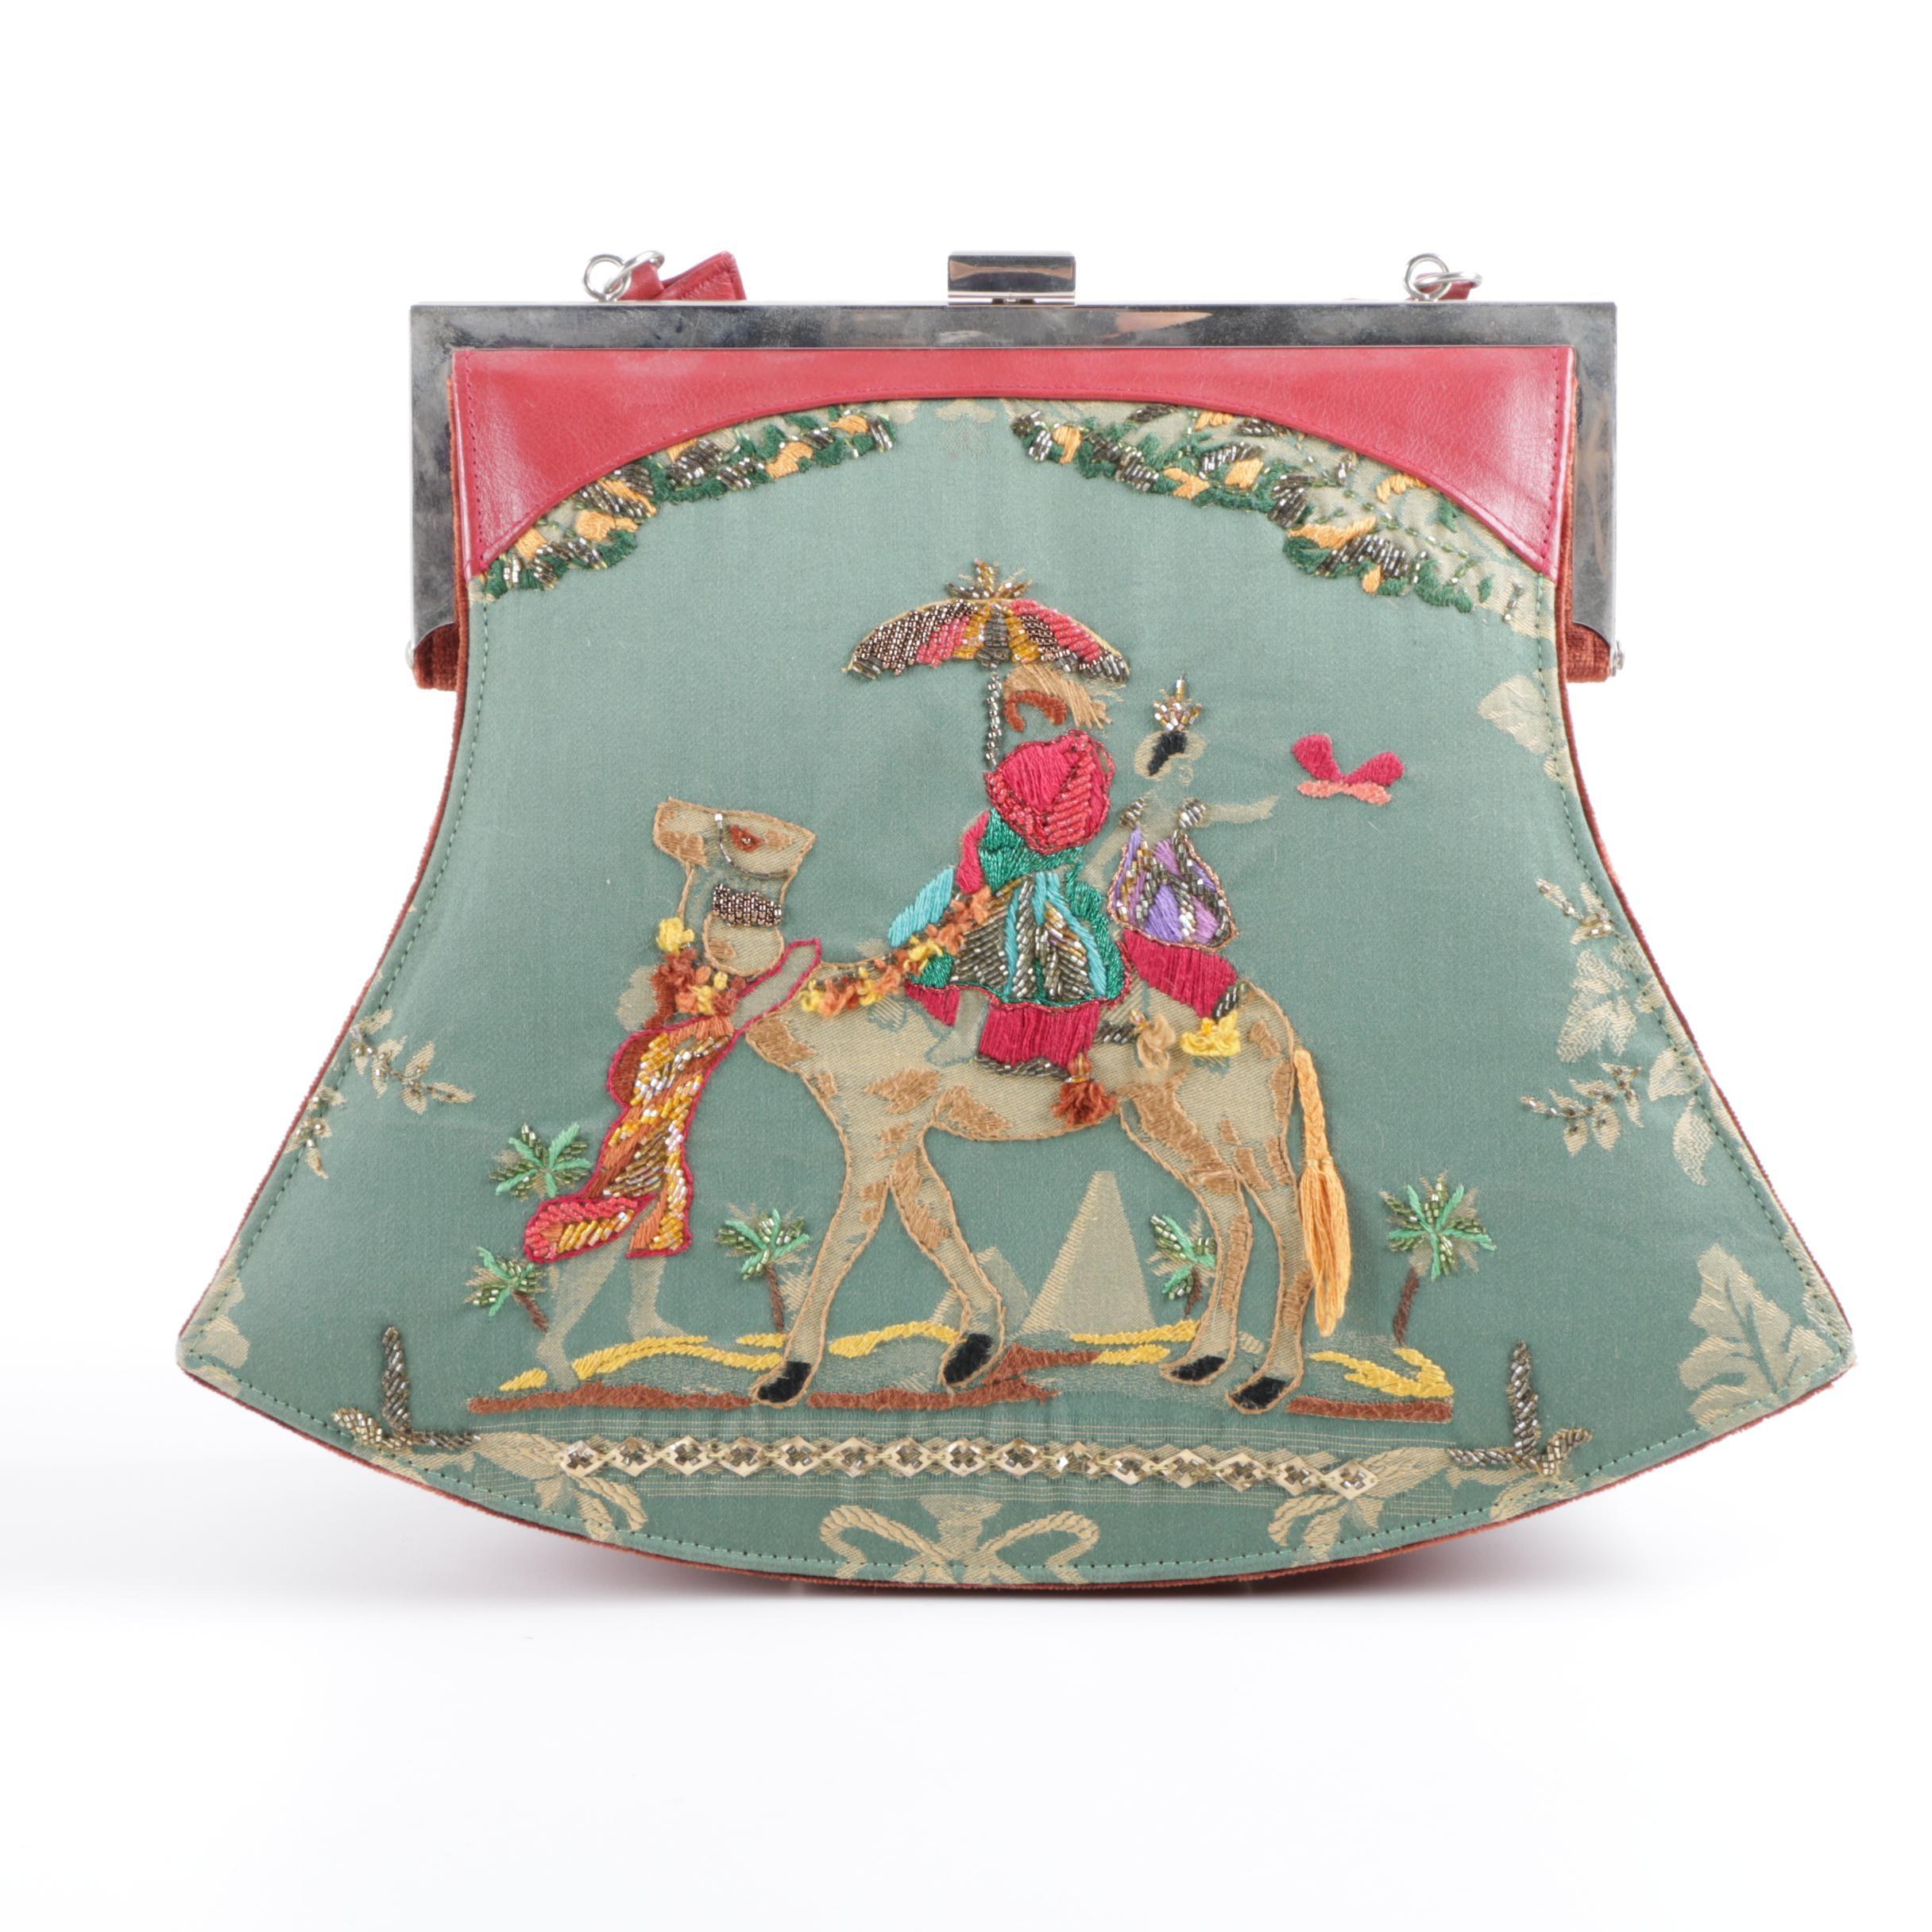 Pat Vini Embroidered Top Handle Handbag with Camel Motif